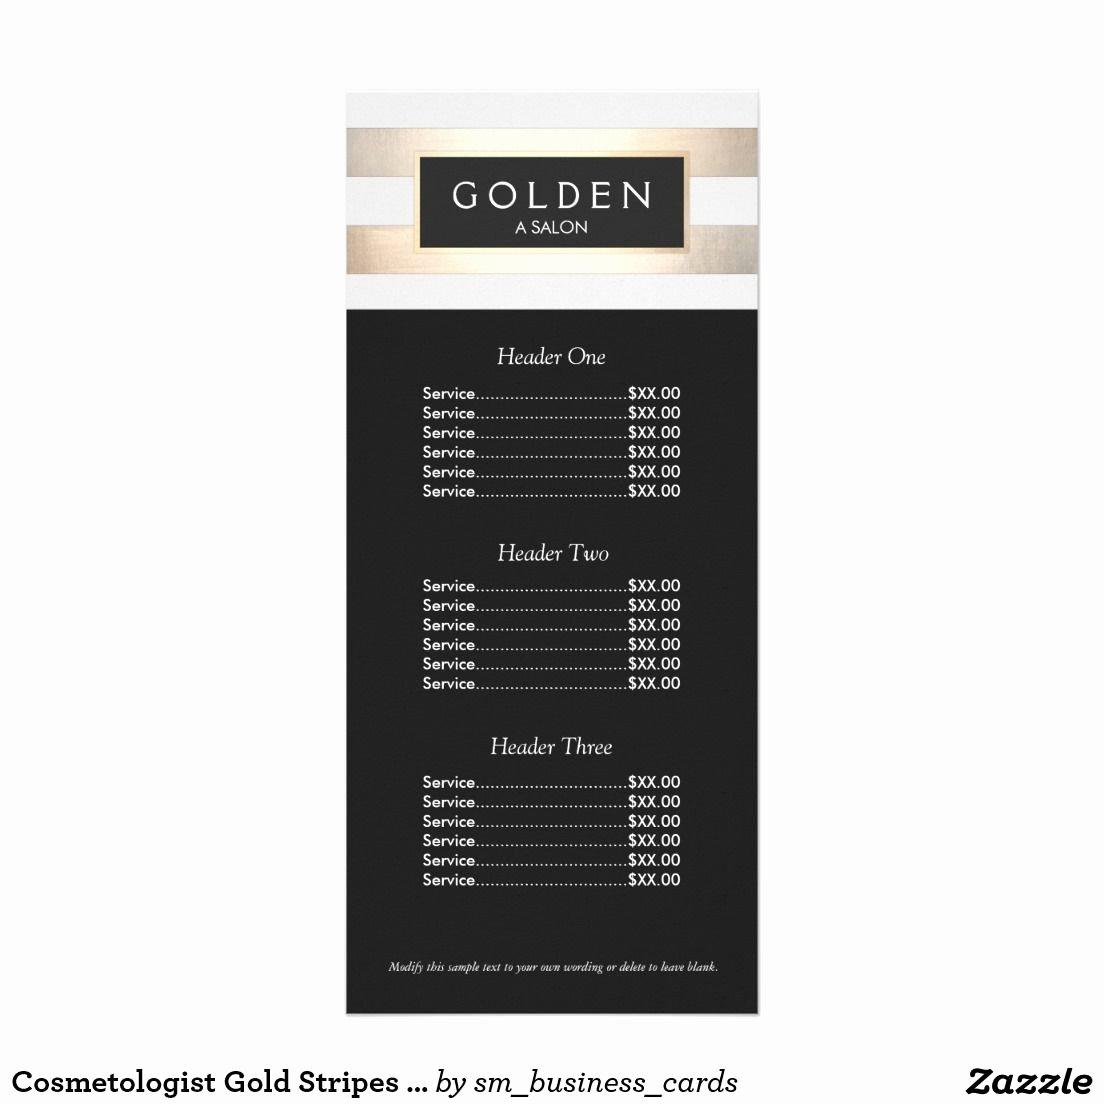 Nail Salon Price List Template Fresh Cosmetologist Gold Stripes Hair Salon A Price Menu Zazzle